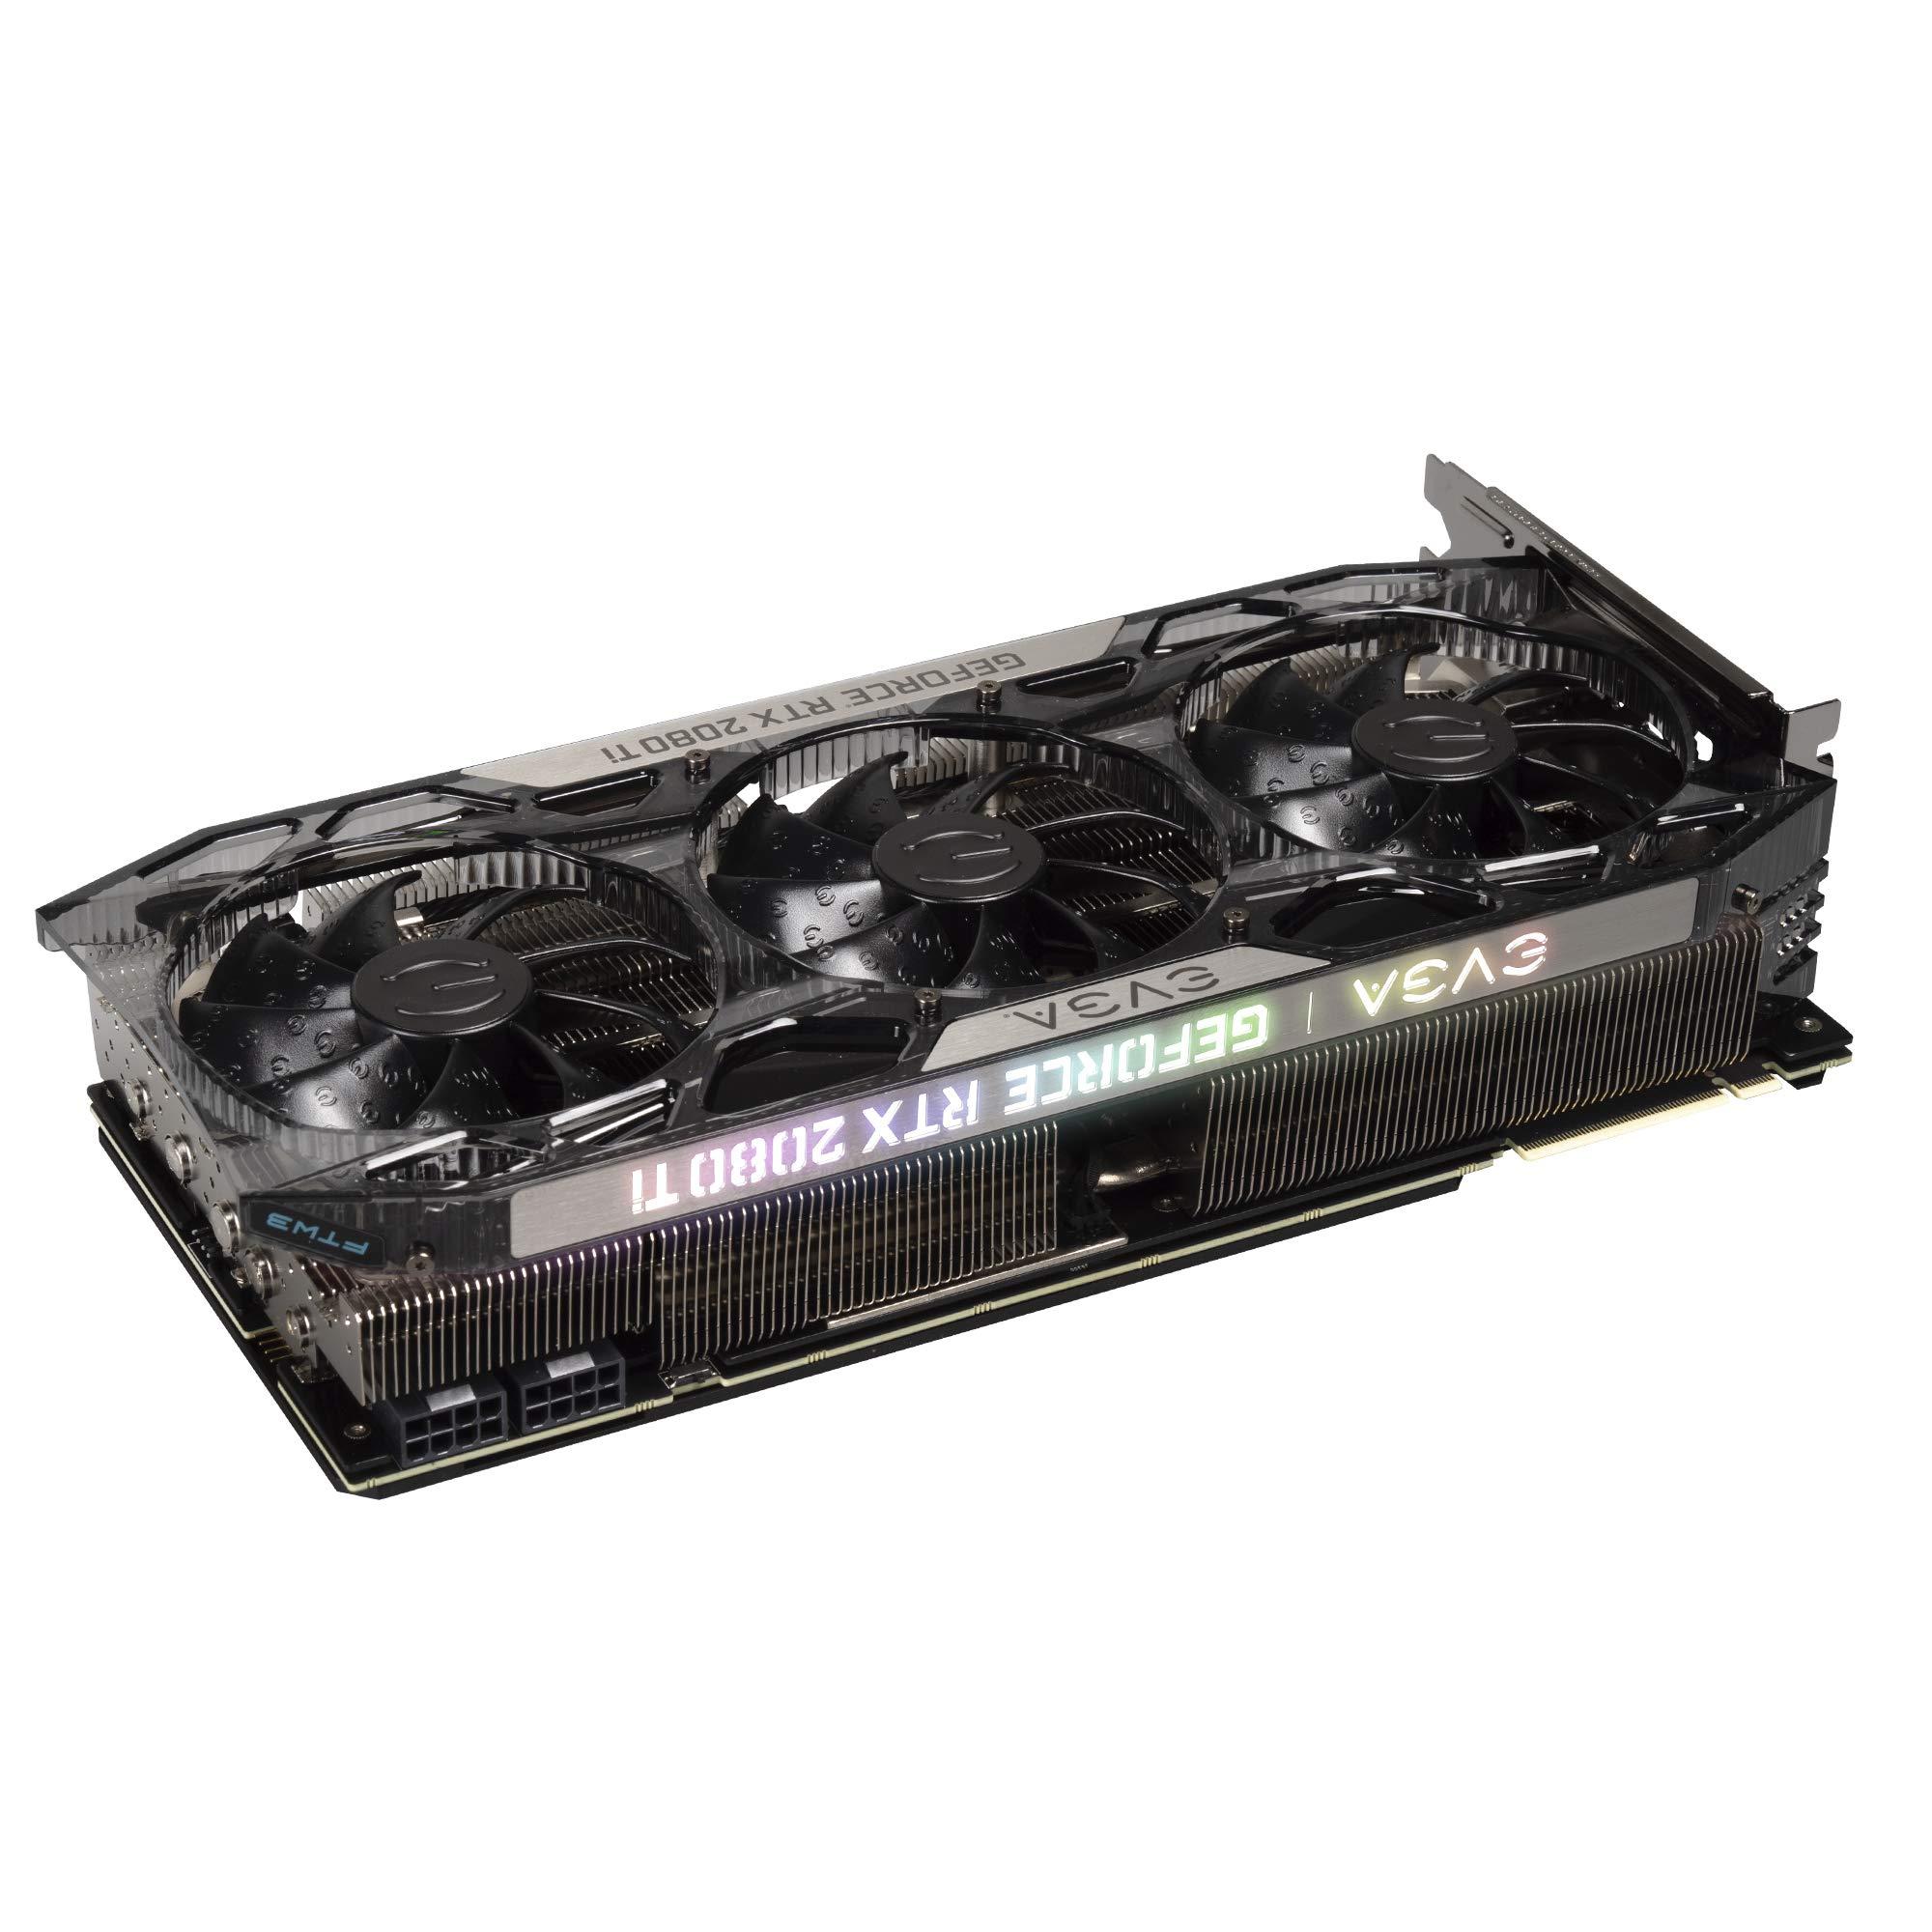 EVGA GeForce RTX 2080 Ti FTW3 Ultra Gaming, 11GB GDDR6, iCX2 & RGB LED Graphics Card 11G-P4-2487-KR by EVGA (Image #6)